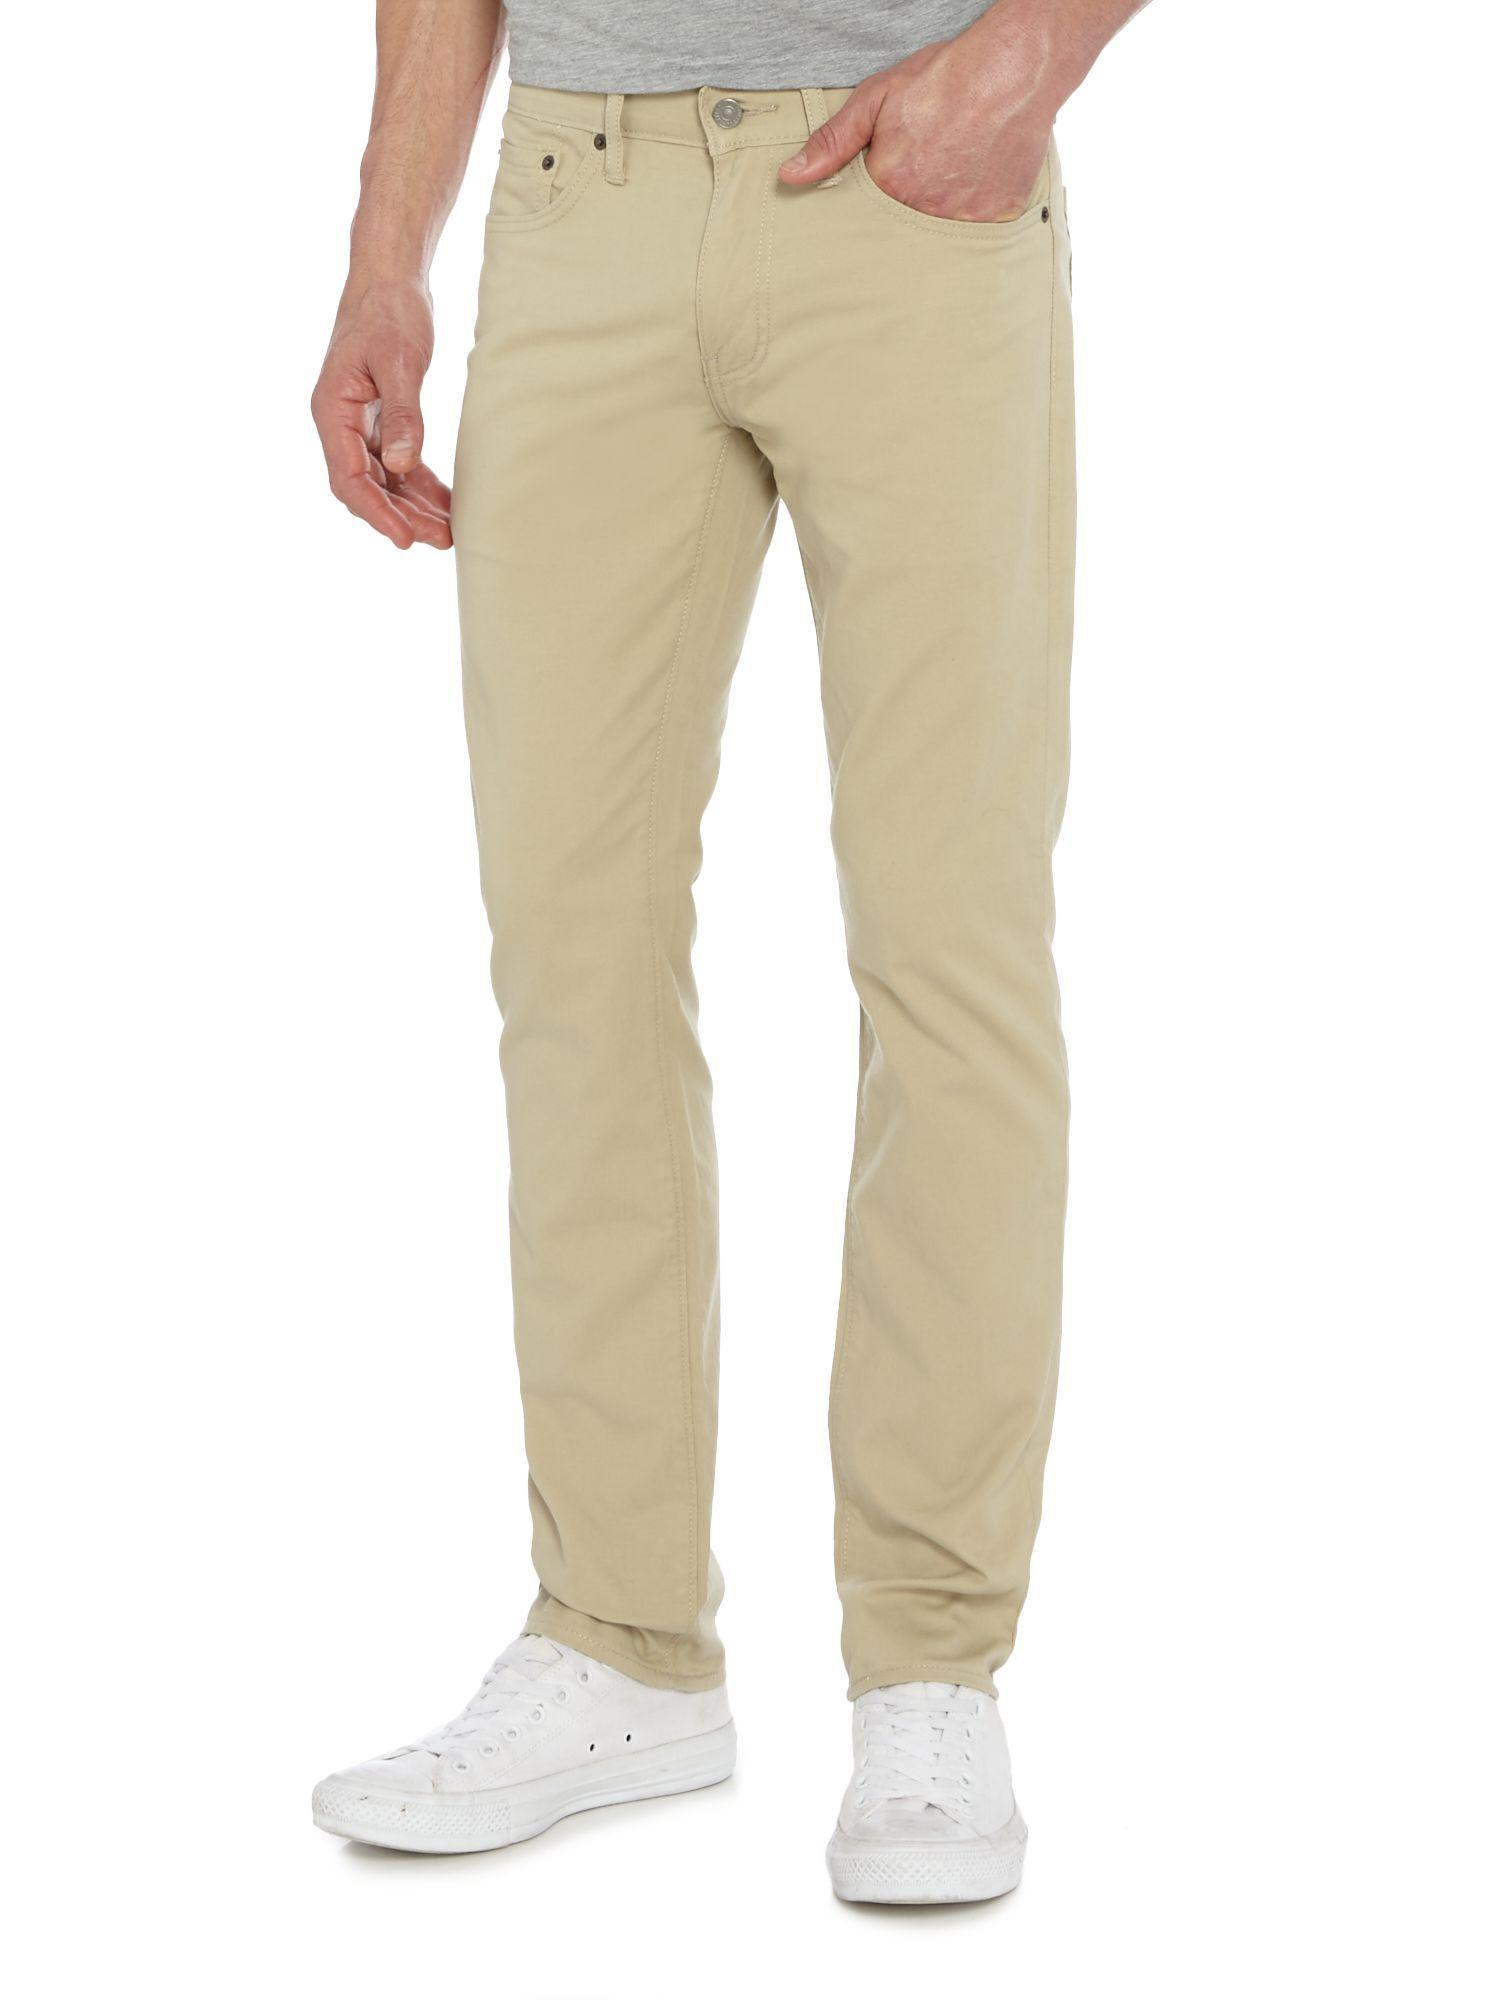 Lyst Levi S 511 Slim Fit Beige Jeans In Natural For Men